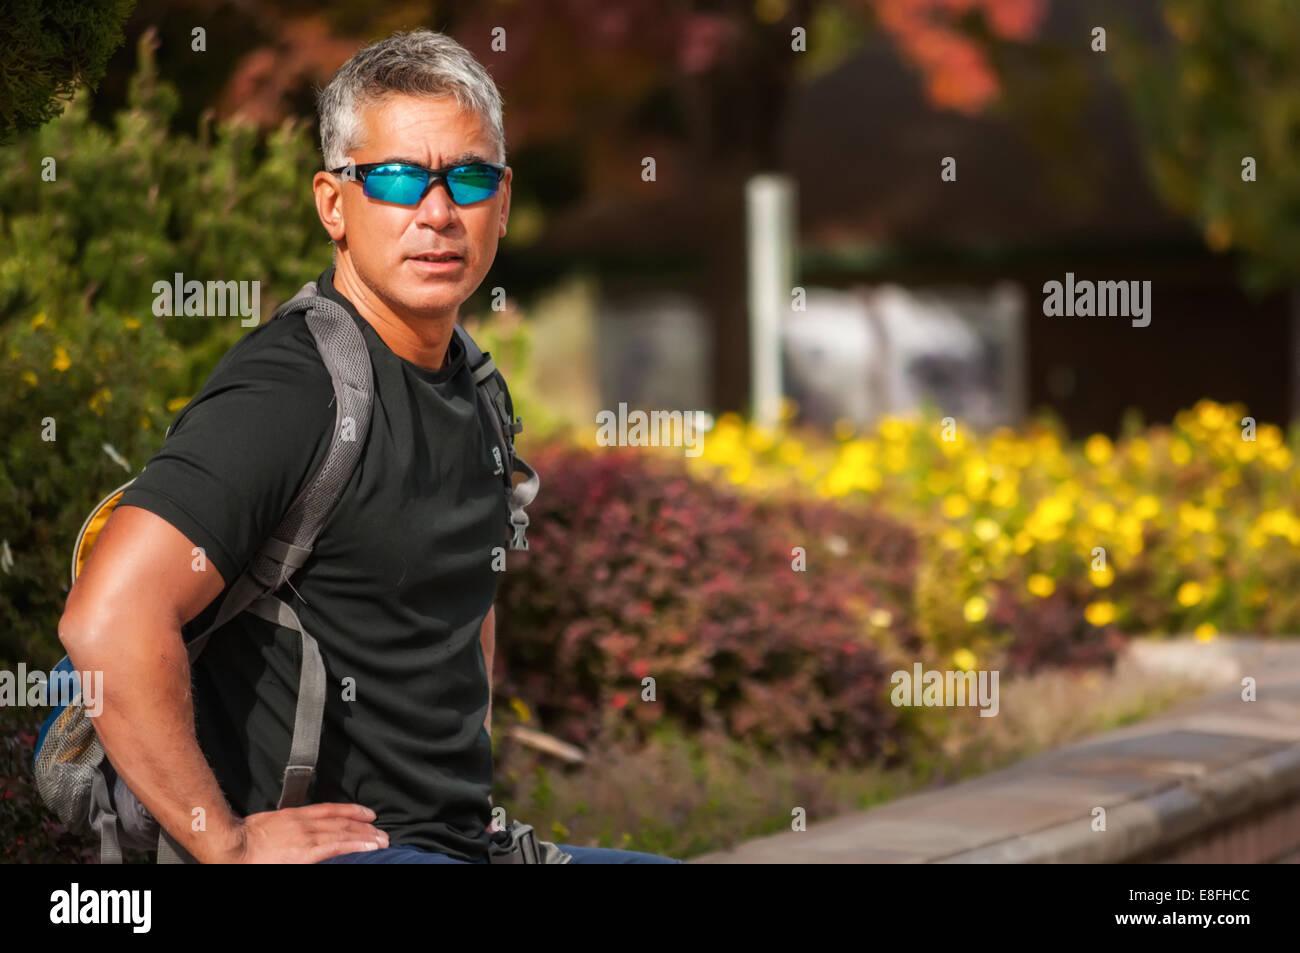 USA, Idaho, Ada County, Boise, Portrait of athletic man wearing sunglasses - Stock Image